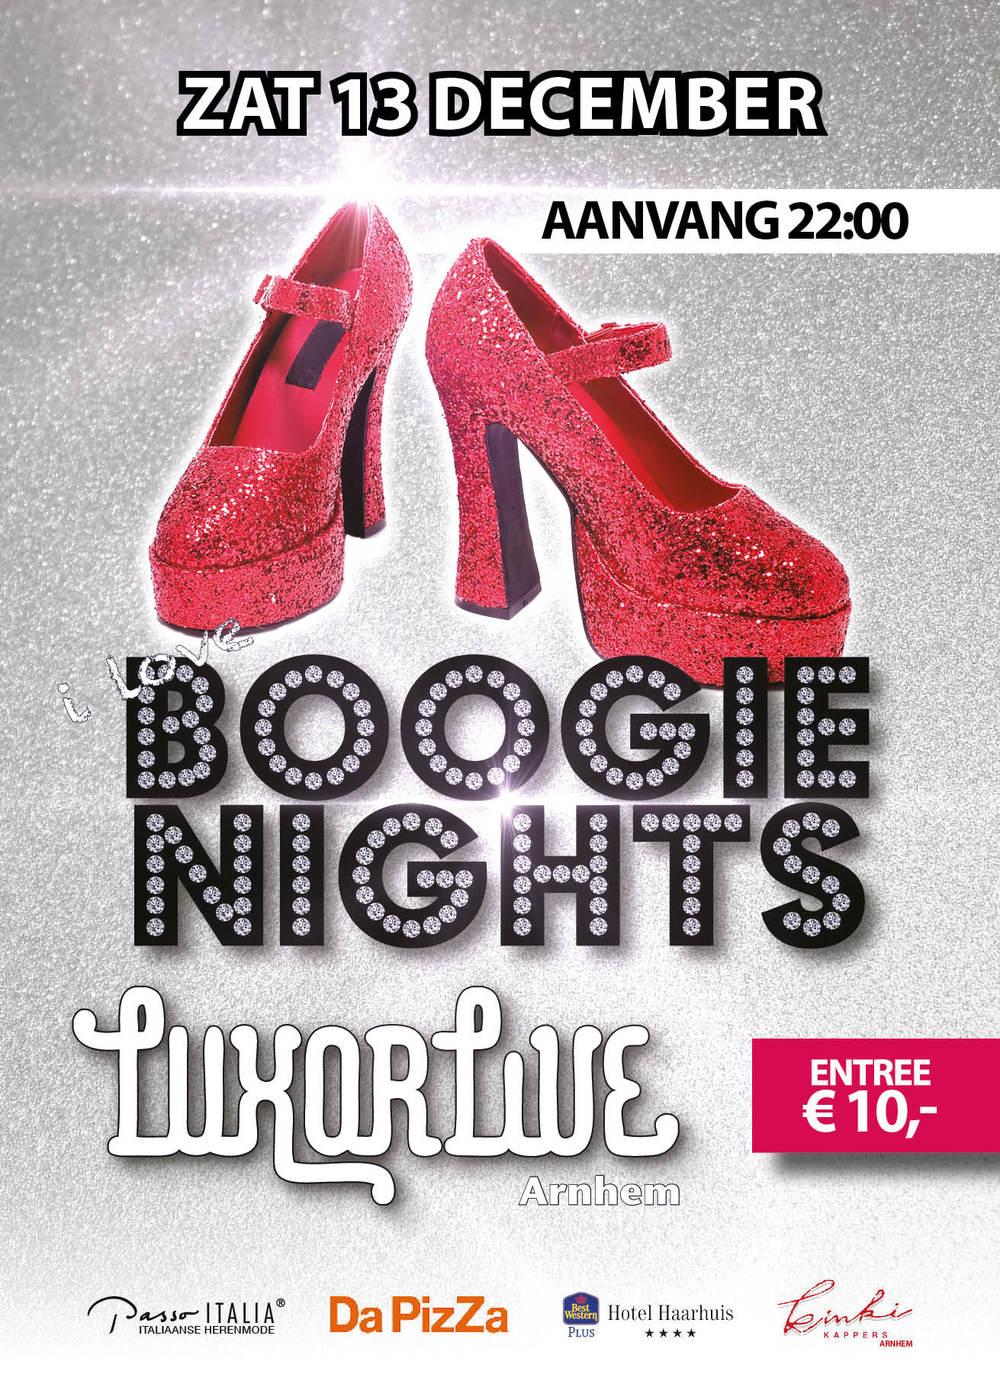 Luxor Live - Boogie Nights